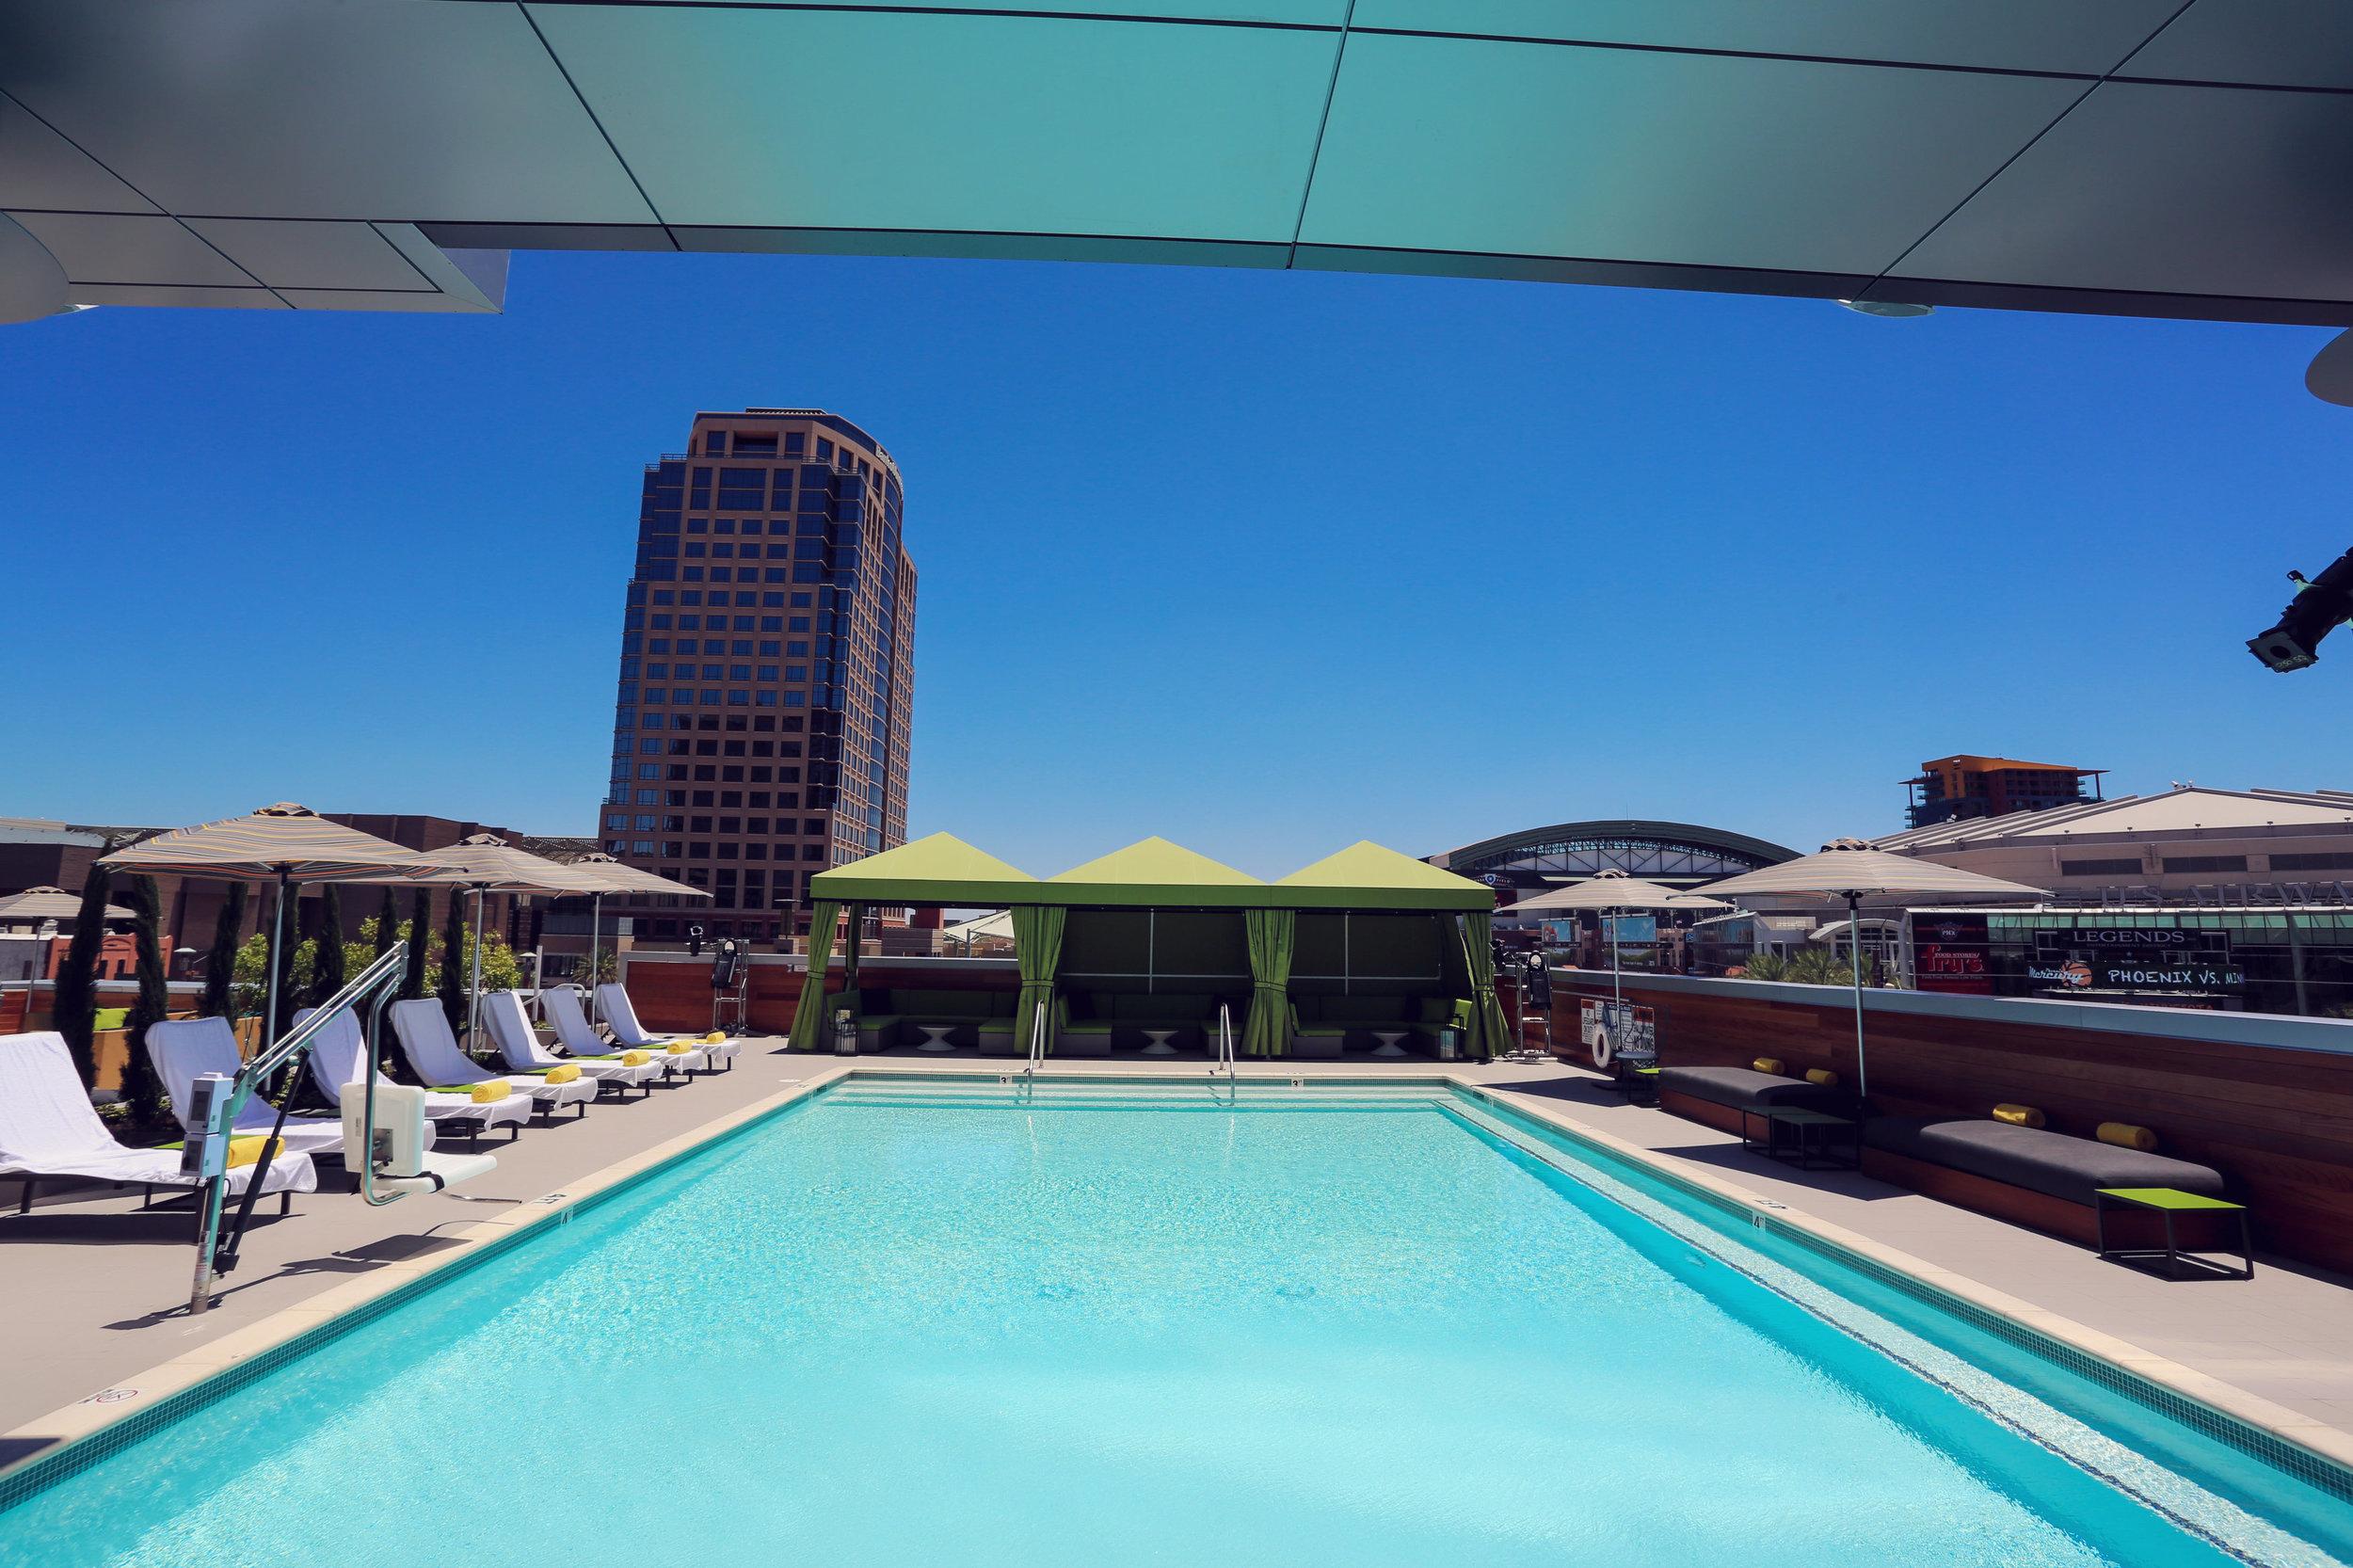 The pool at LUSTRE. image from ArizonaCocktailWeek.com